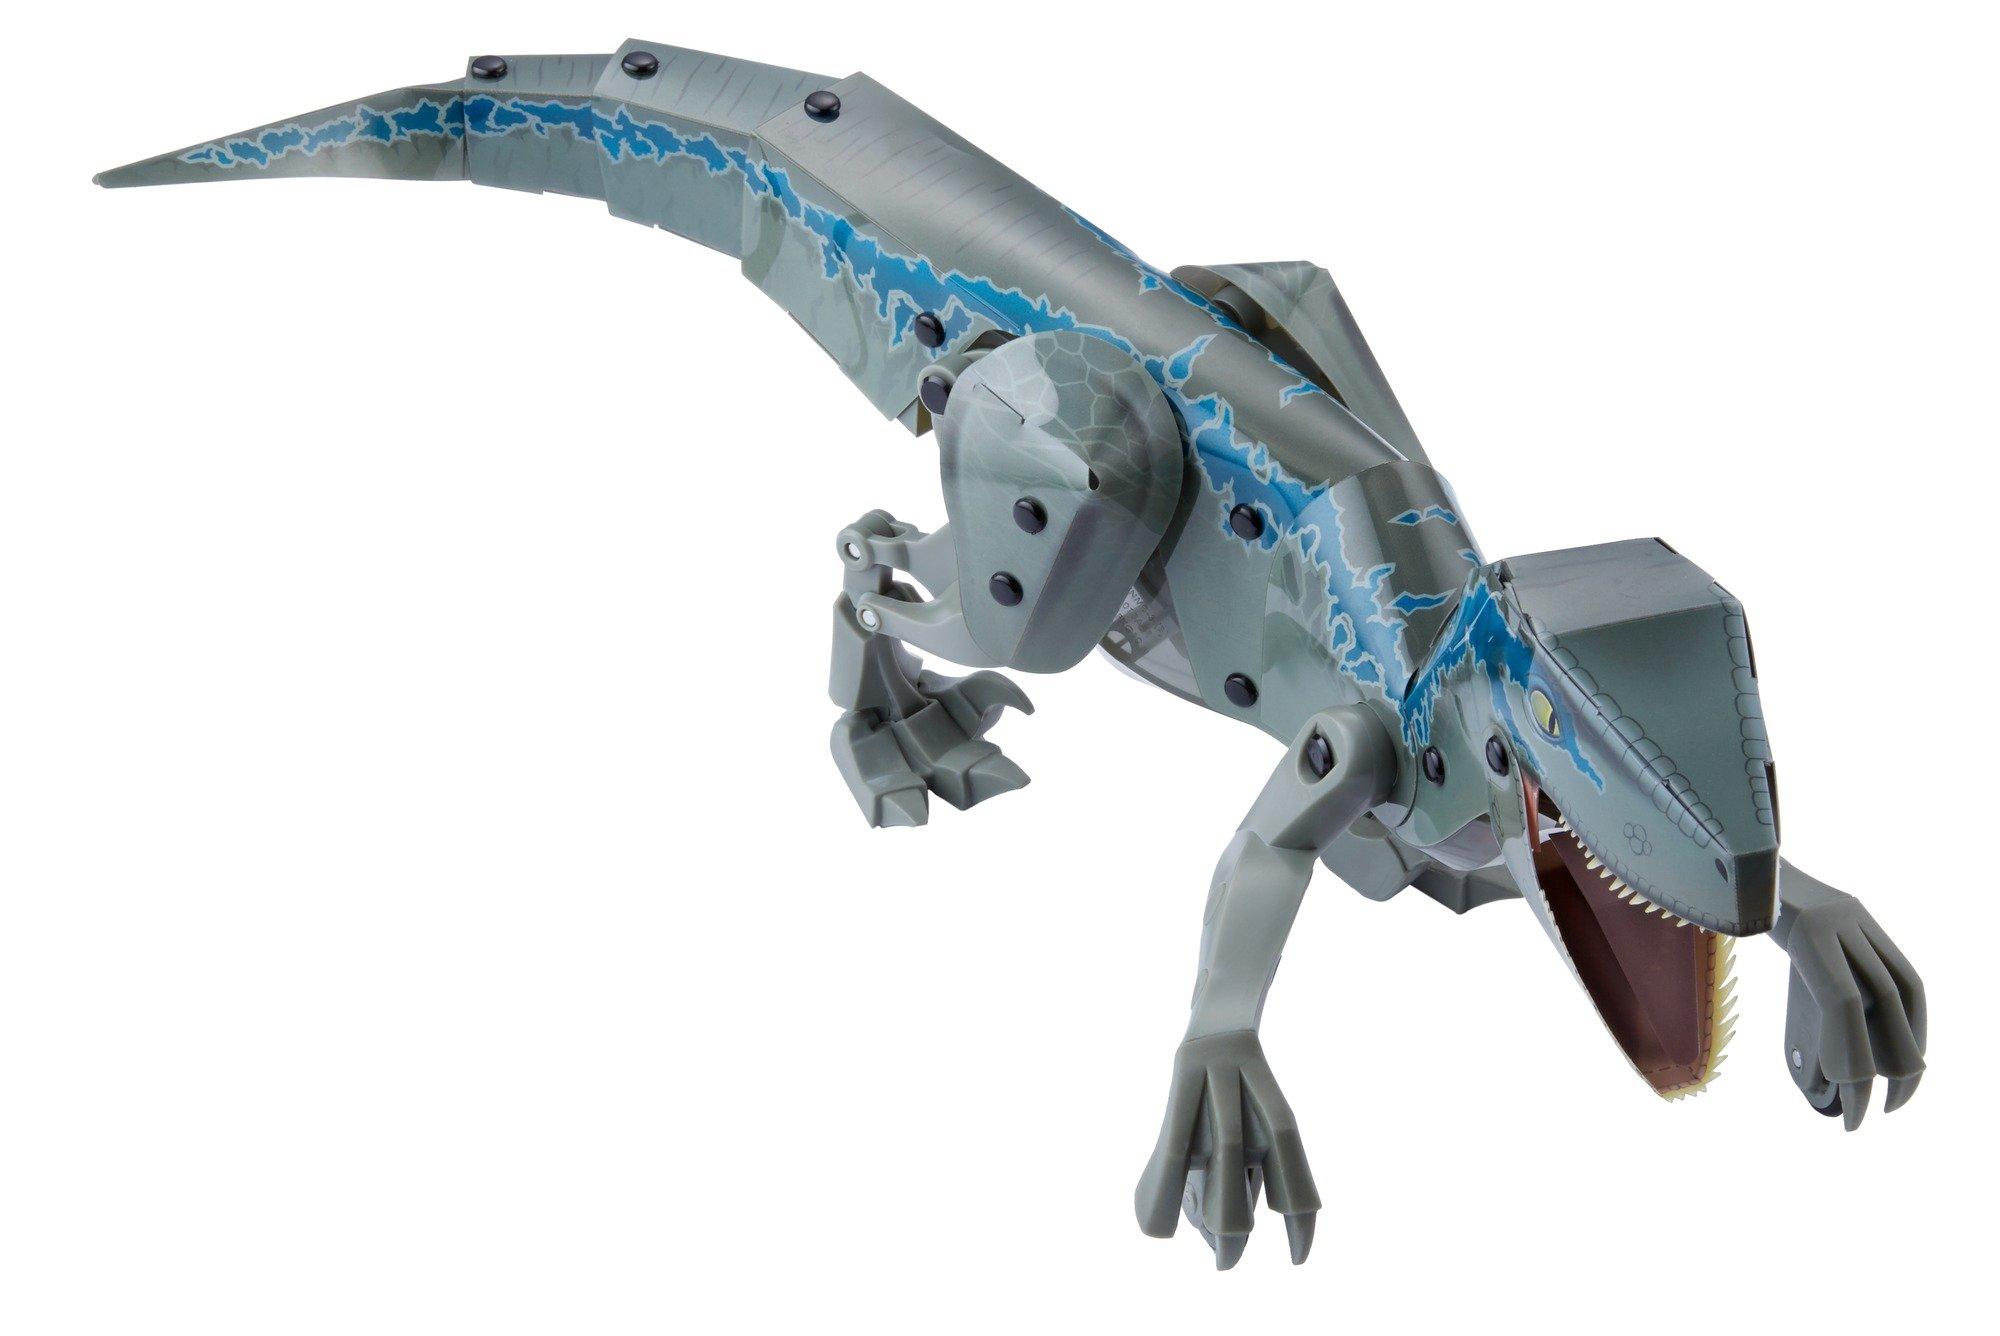 Kamigami Jurassic World Blue Robot by Jurassic World Toys (Image #12)